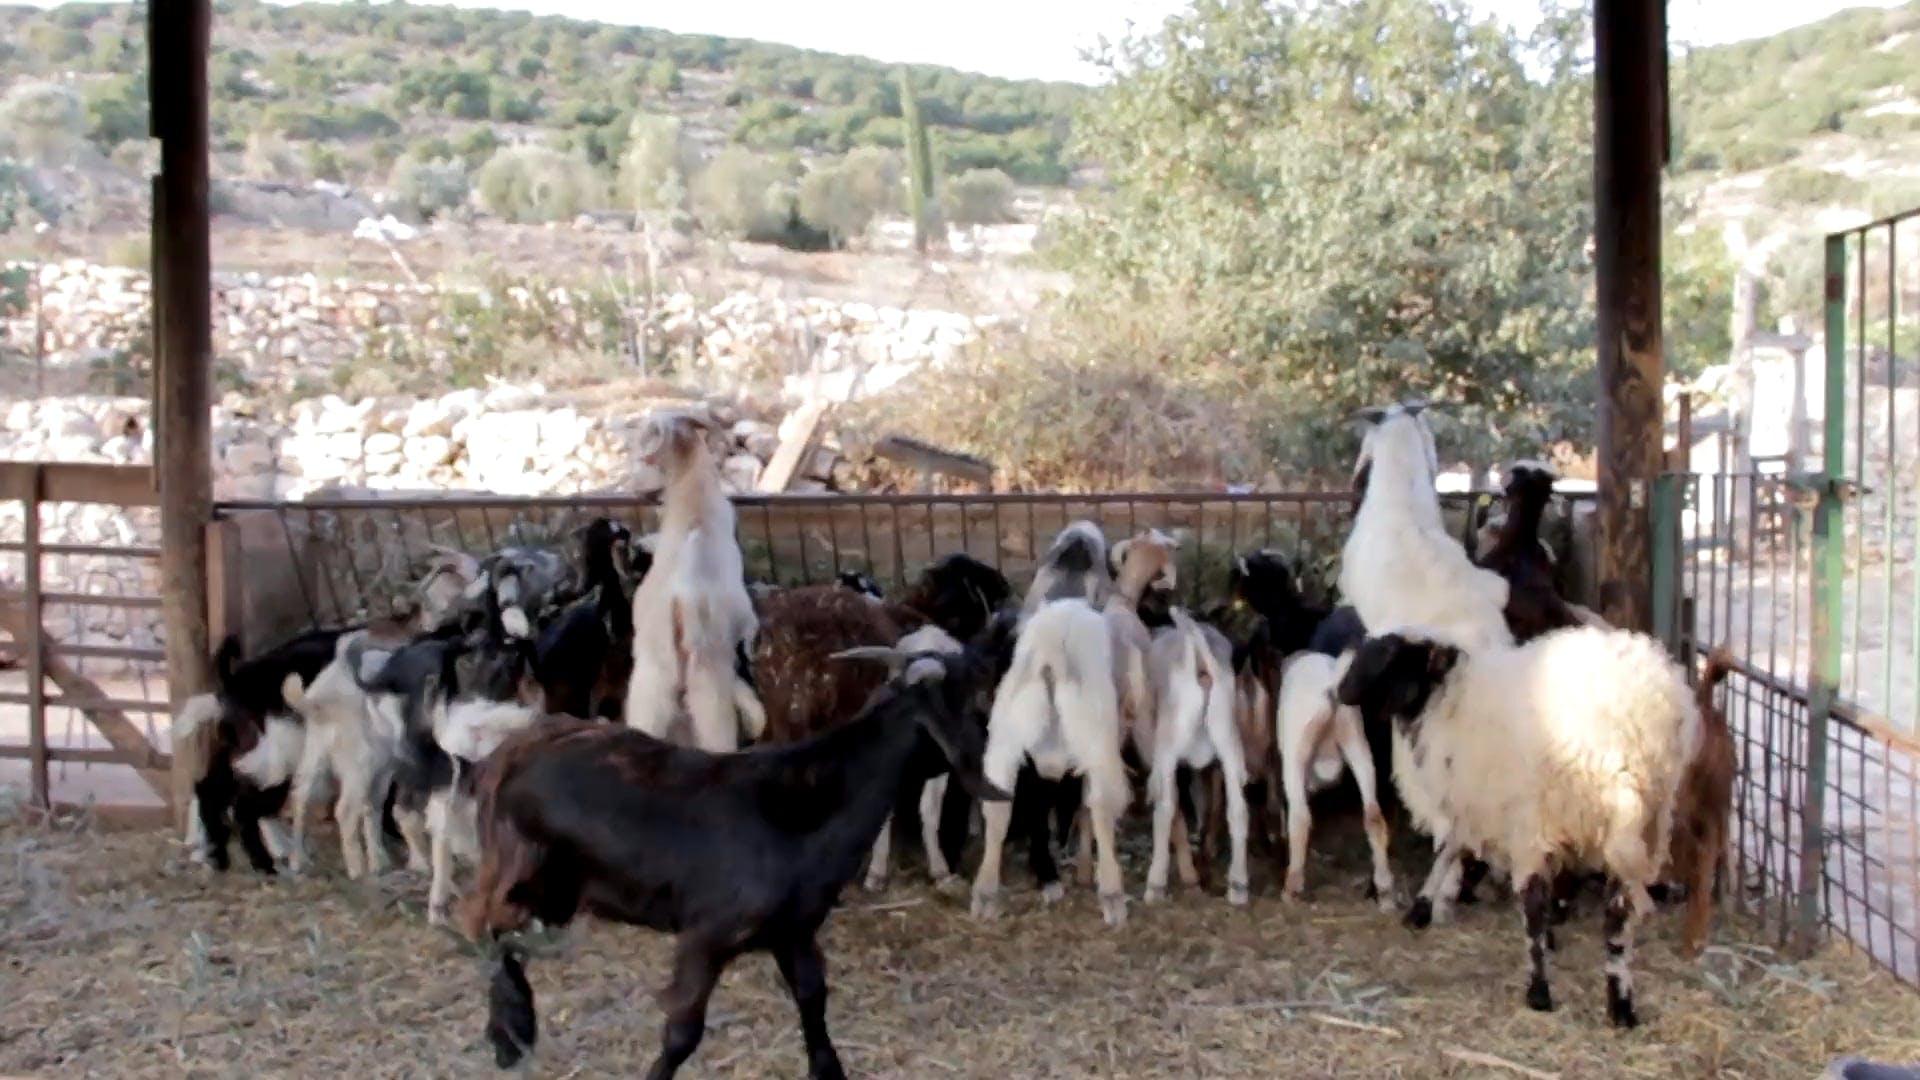 Herd Of Goats Eating